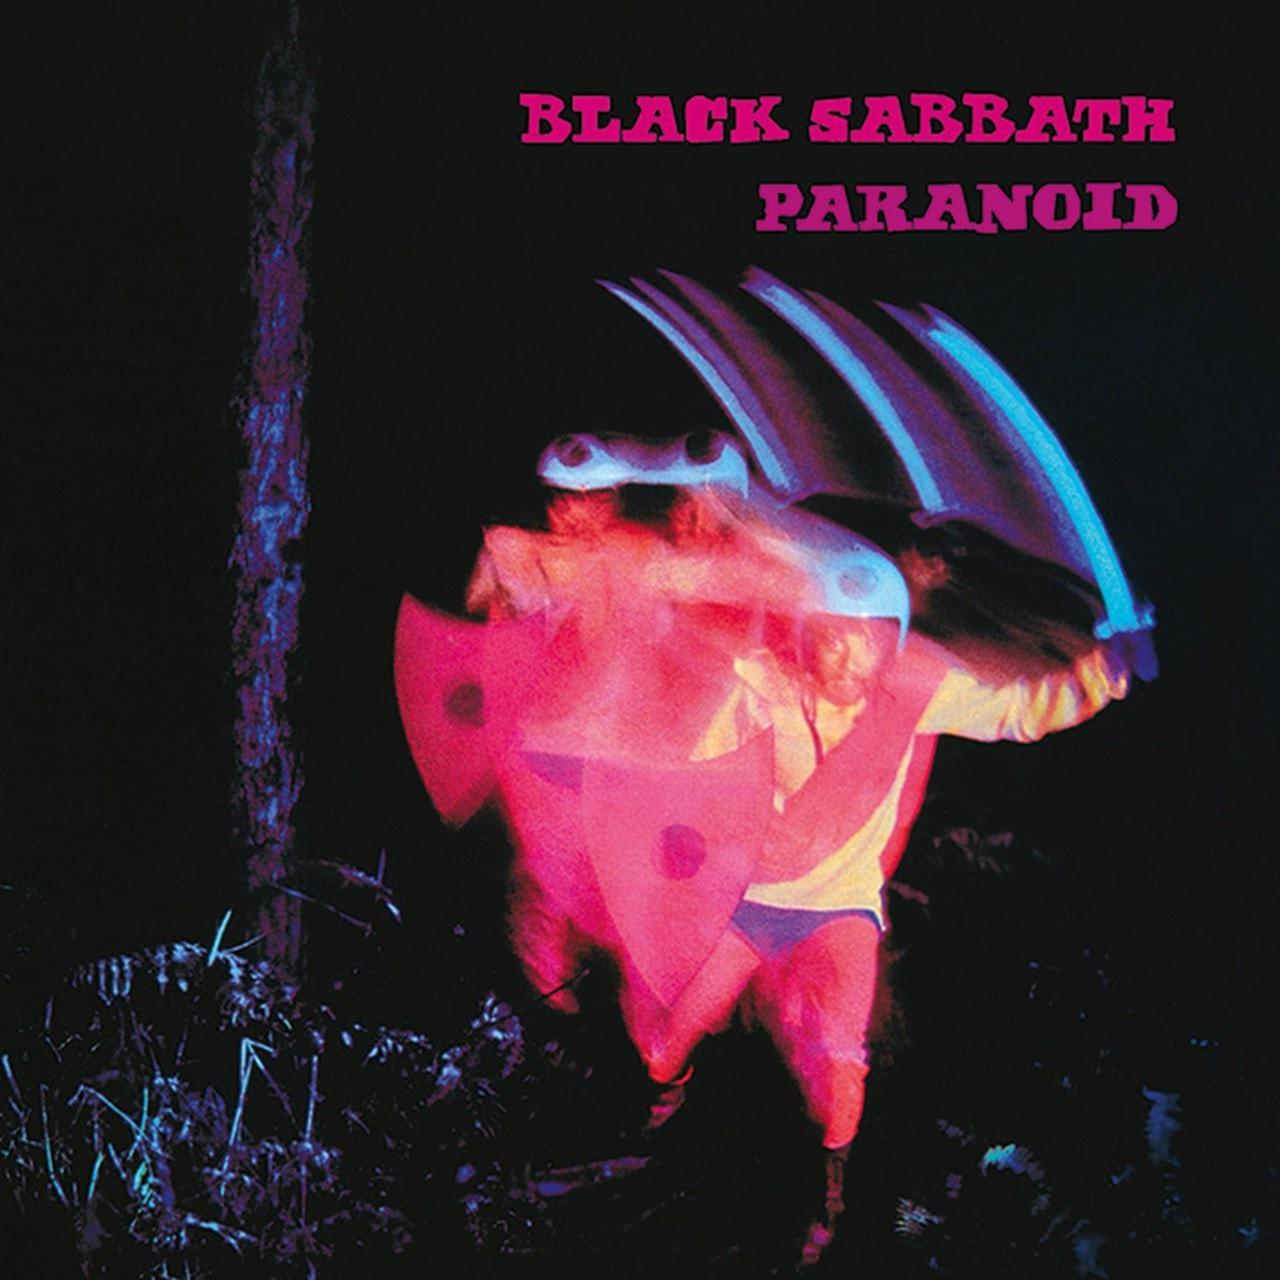 Black Sabbath: Paranoid Canvas Print - 1